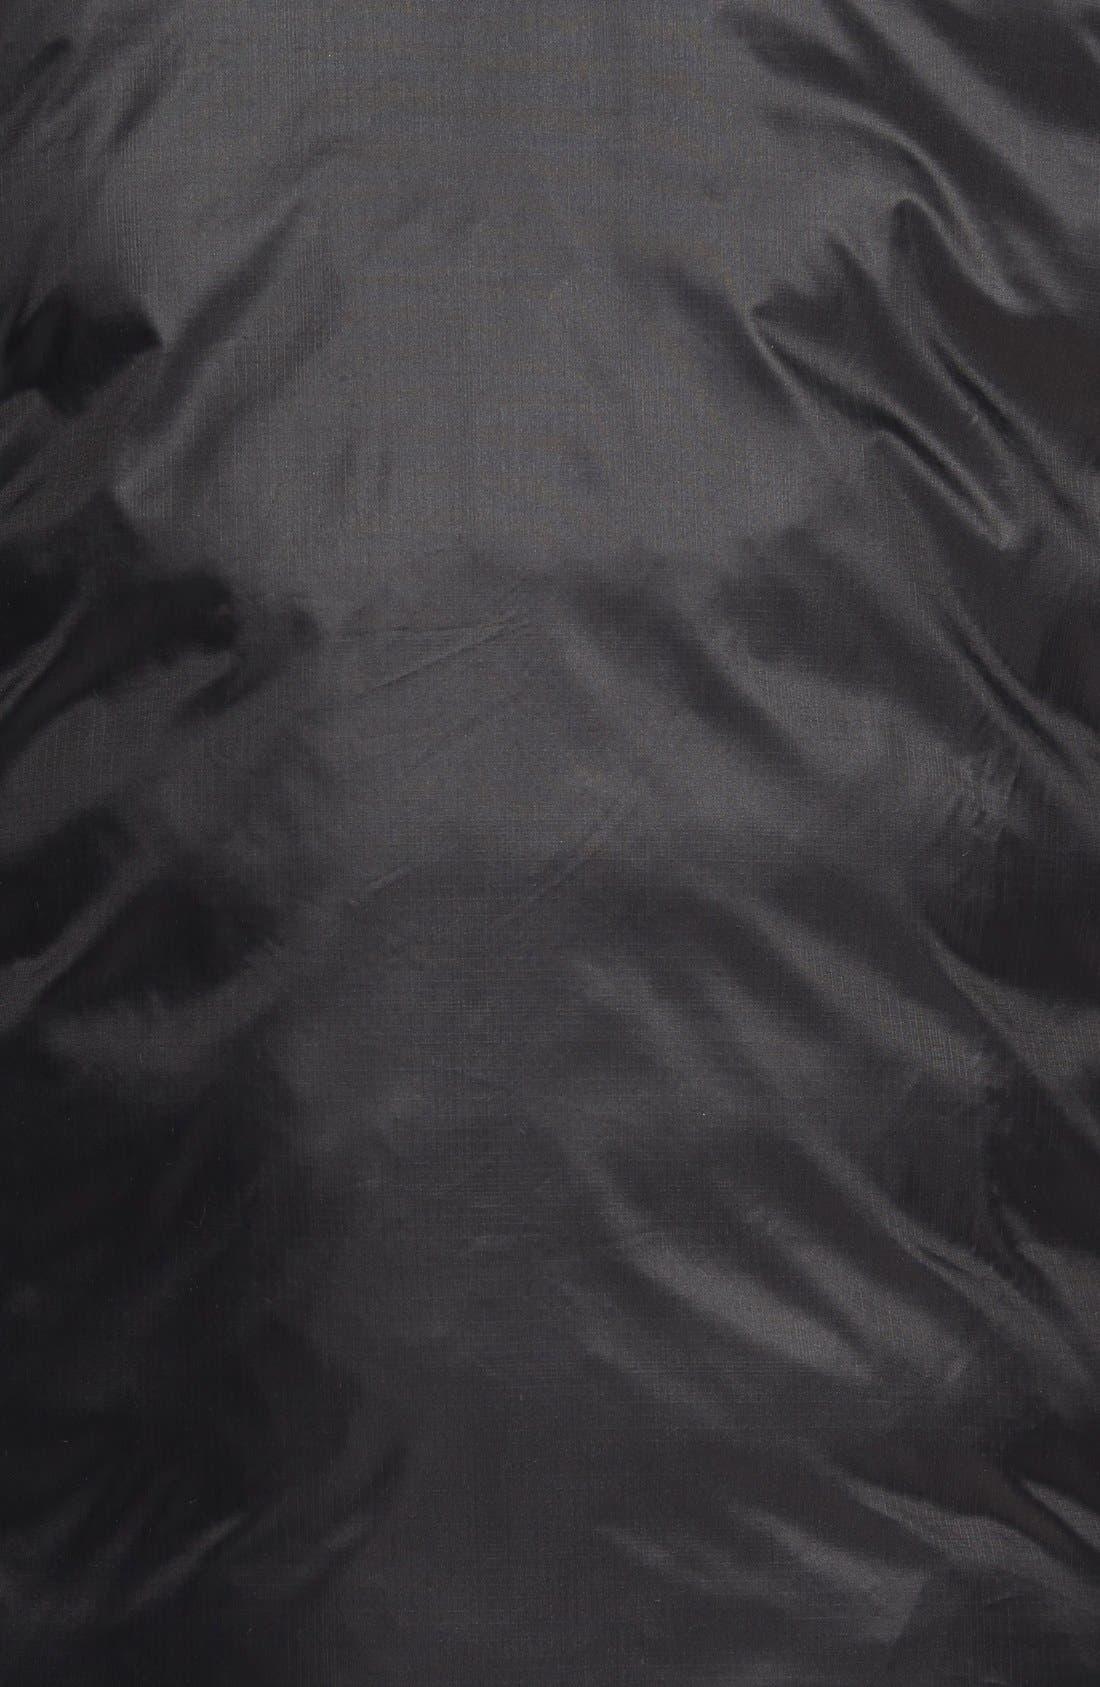 'Lodge' Slim Fit Packable Jacket,                             Alternate thumbnail 10, color,                             BLACK